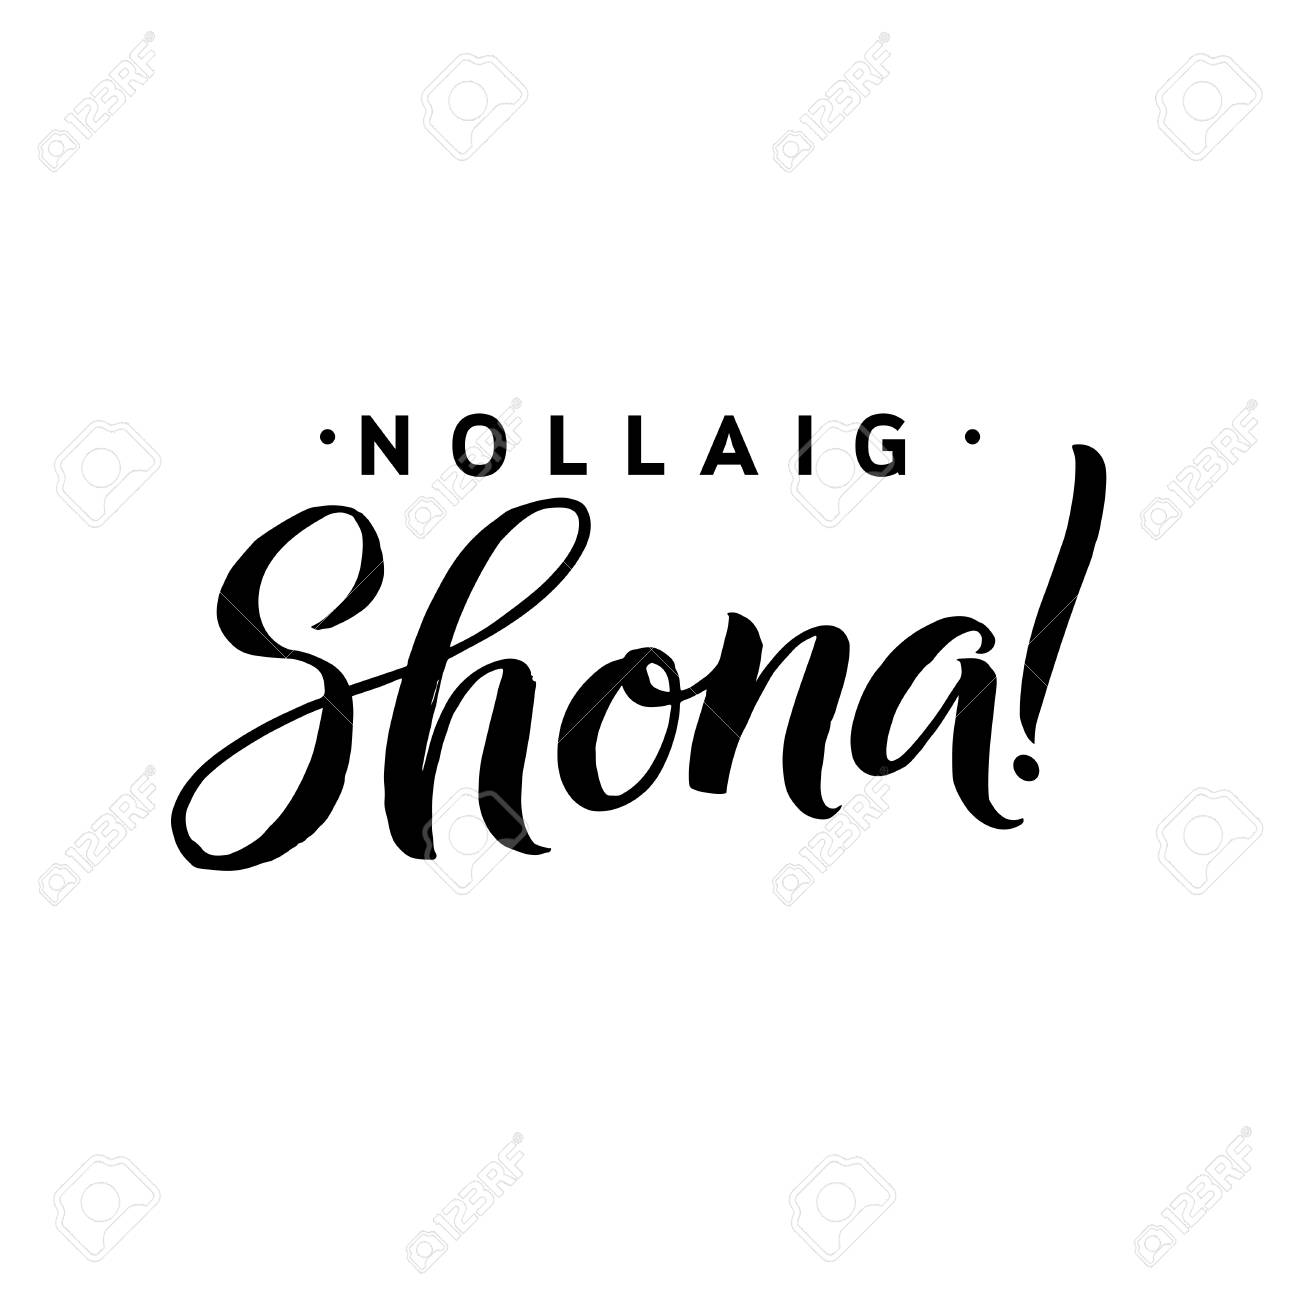 Nollaig Shona. Merry Christmas Calligraphy Template In Irish ...